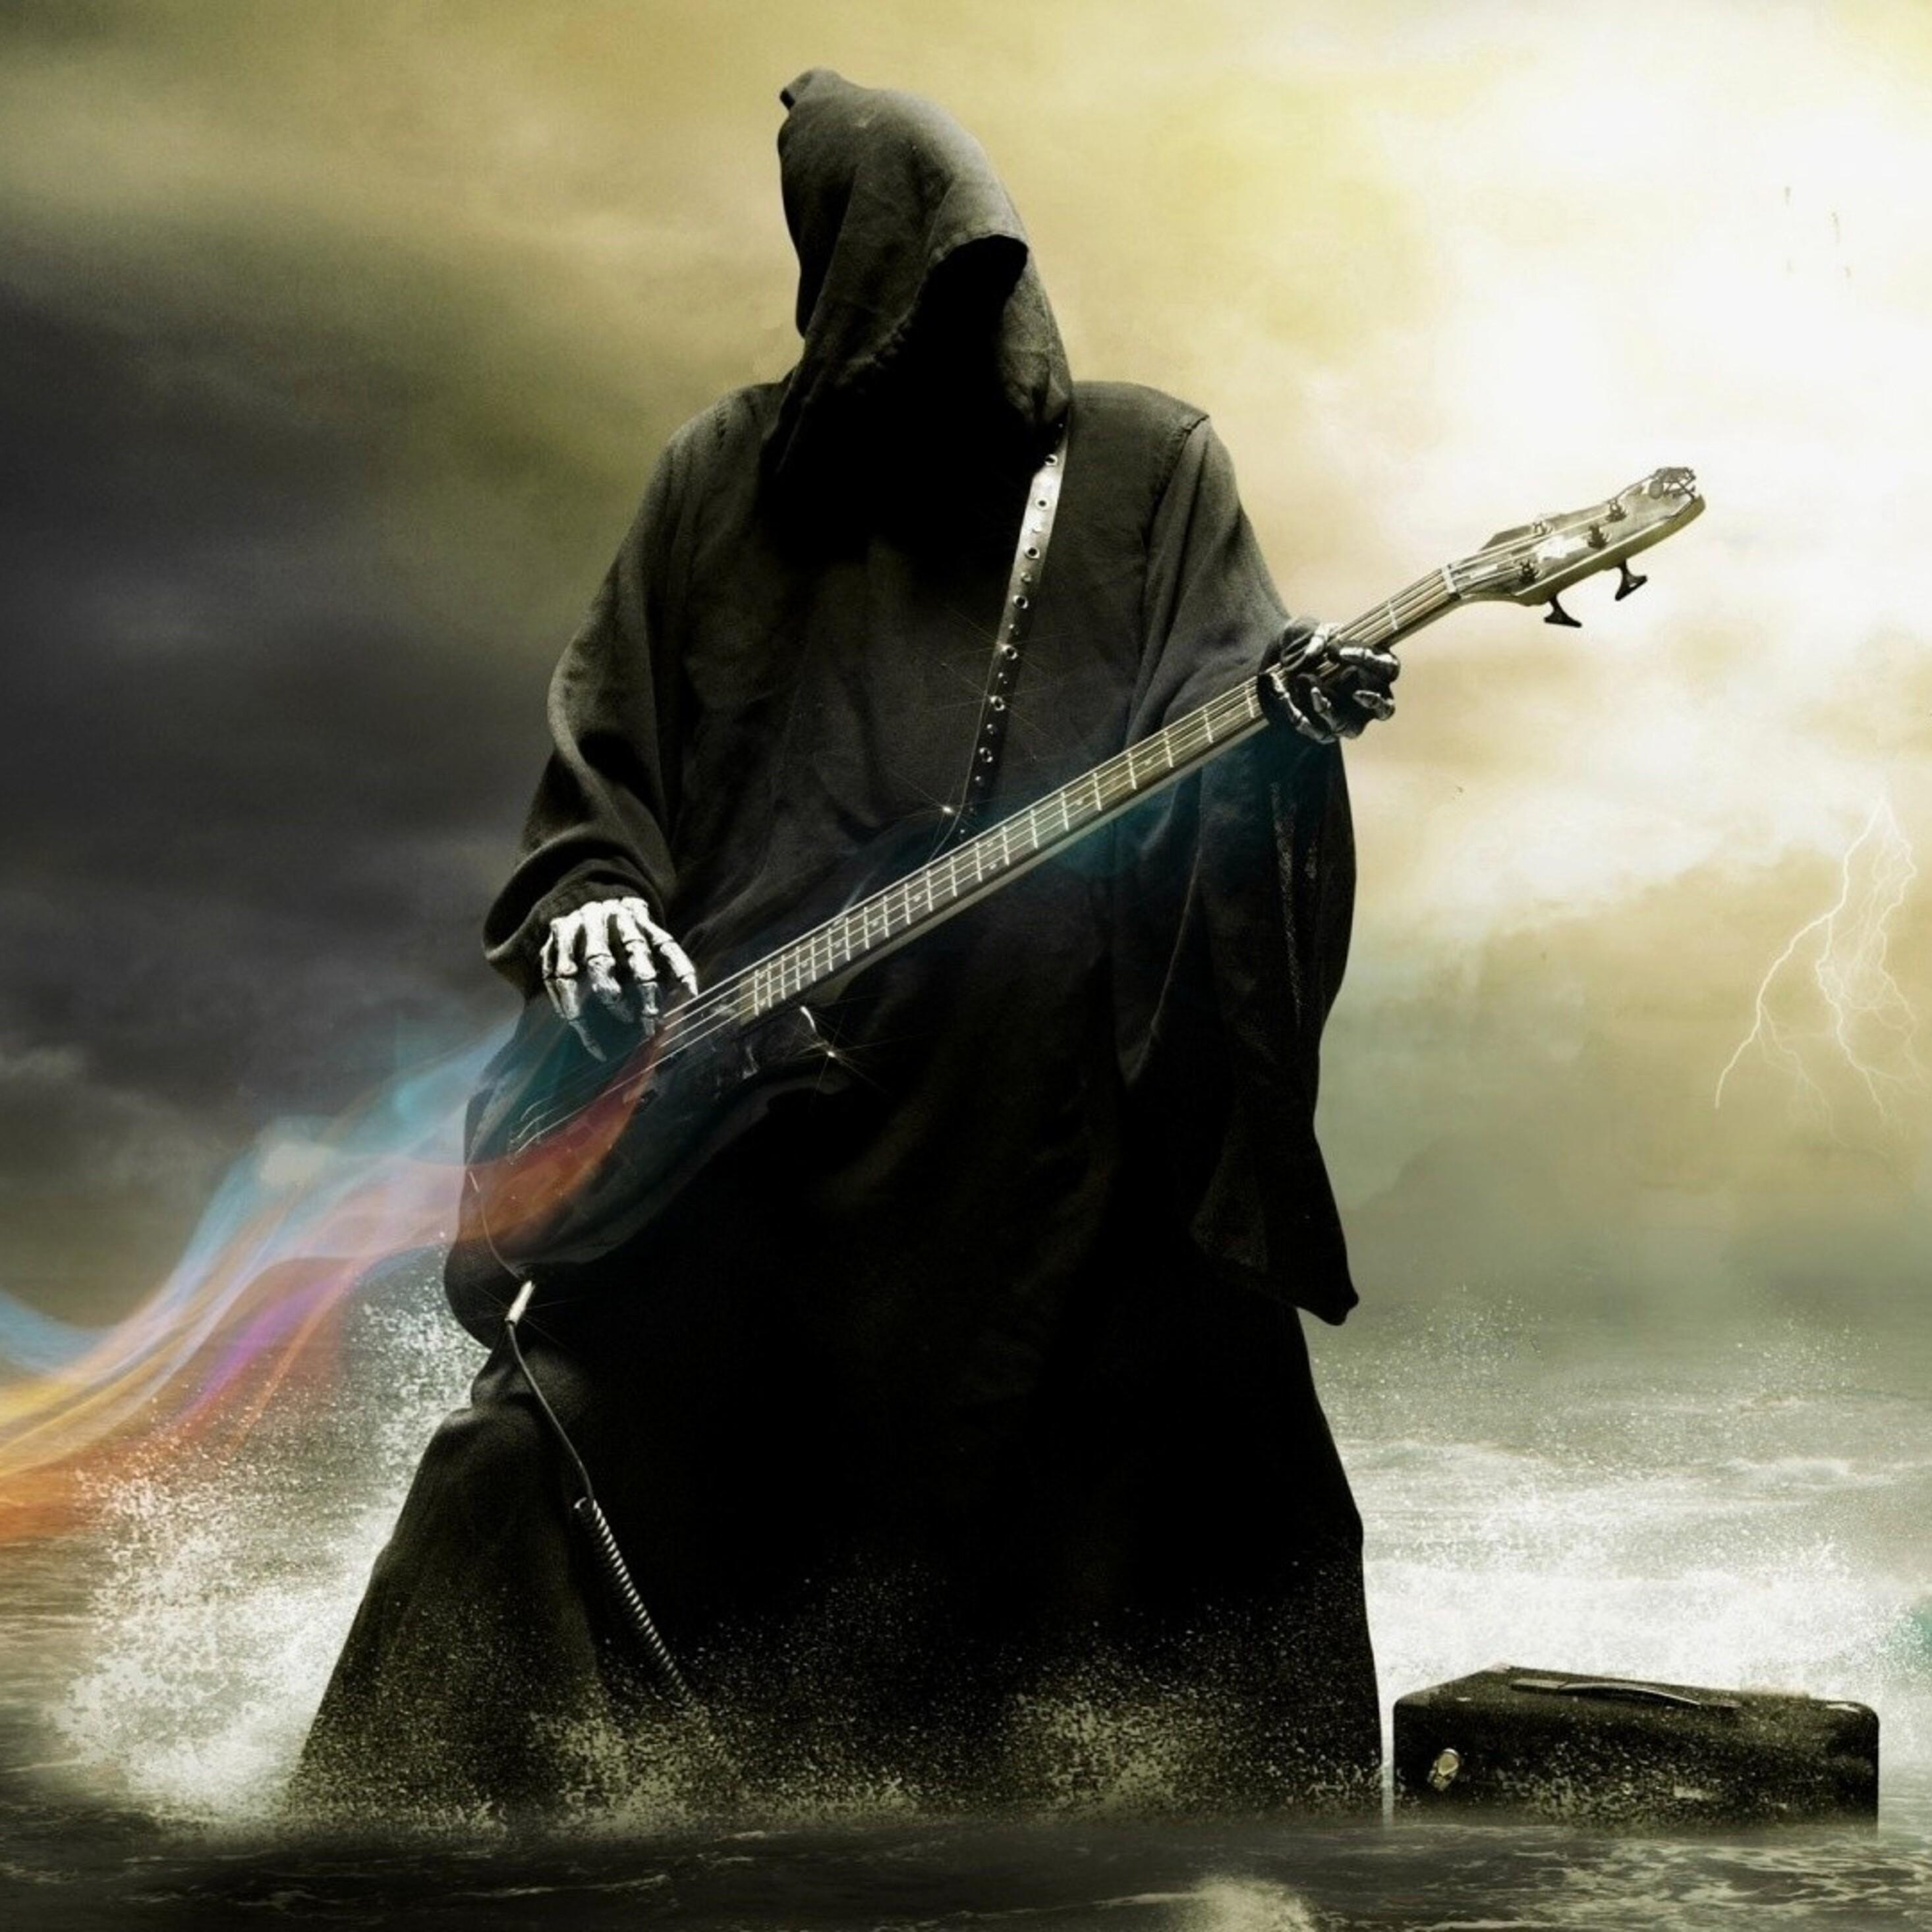 Wallpaper Hd Nature Guitar: 2932x2932 Grim Reaper Playing Guitar Ipad Pro Retina